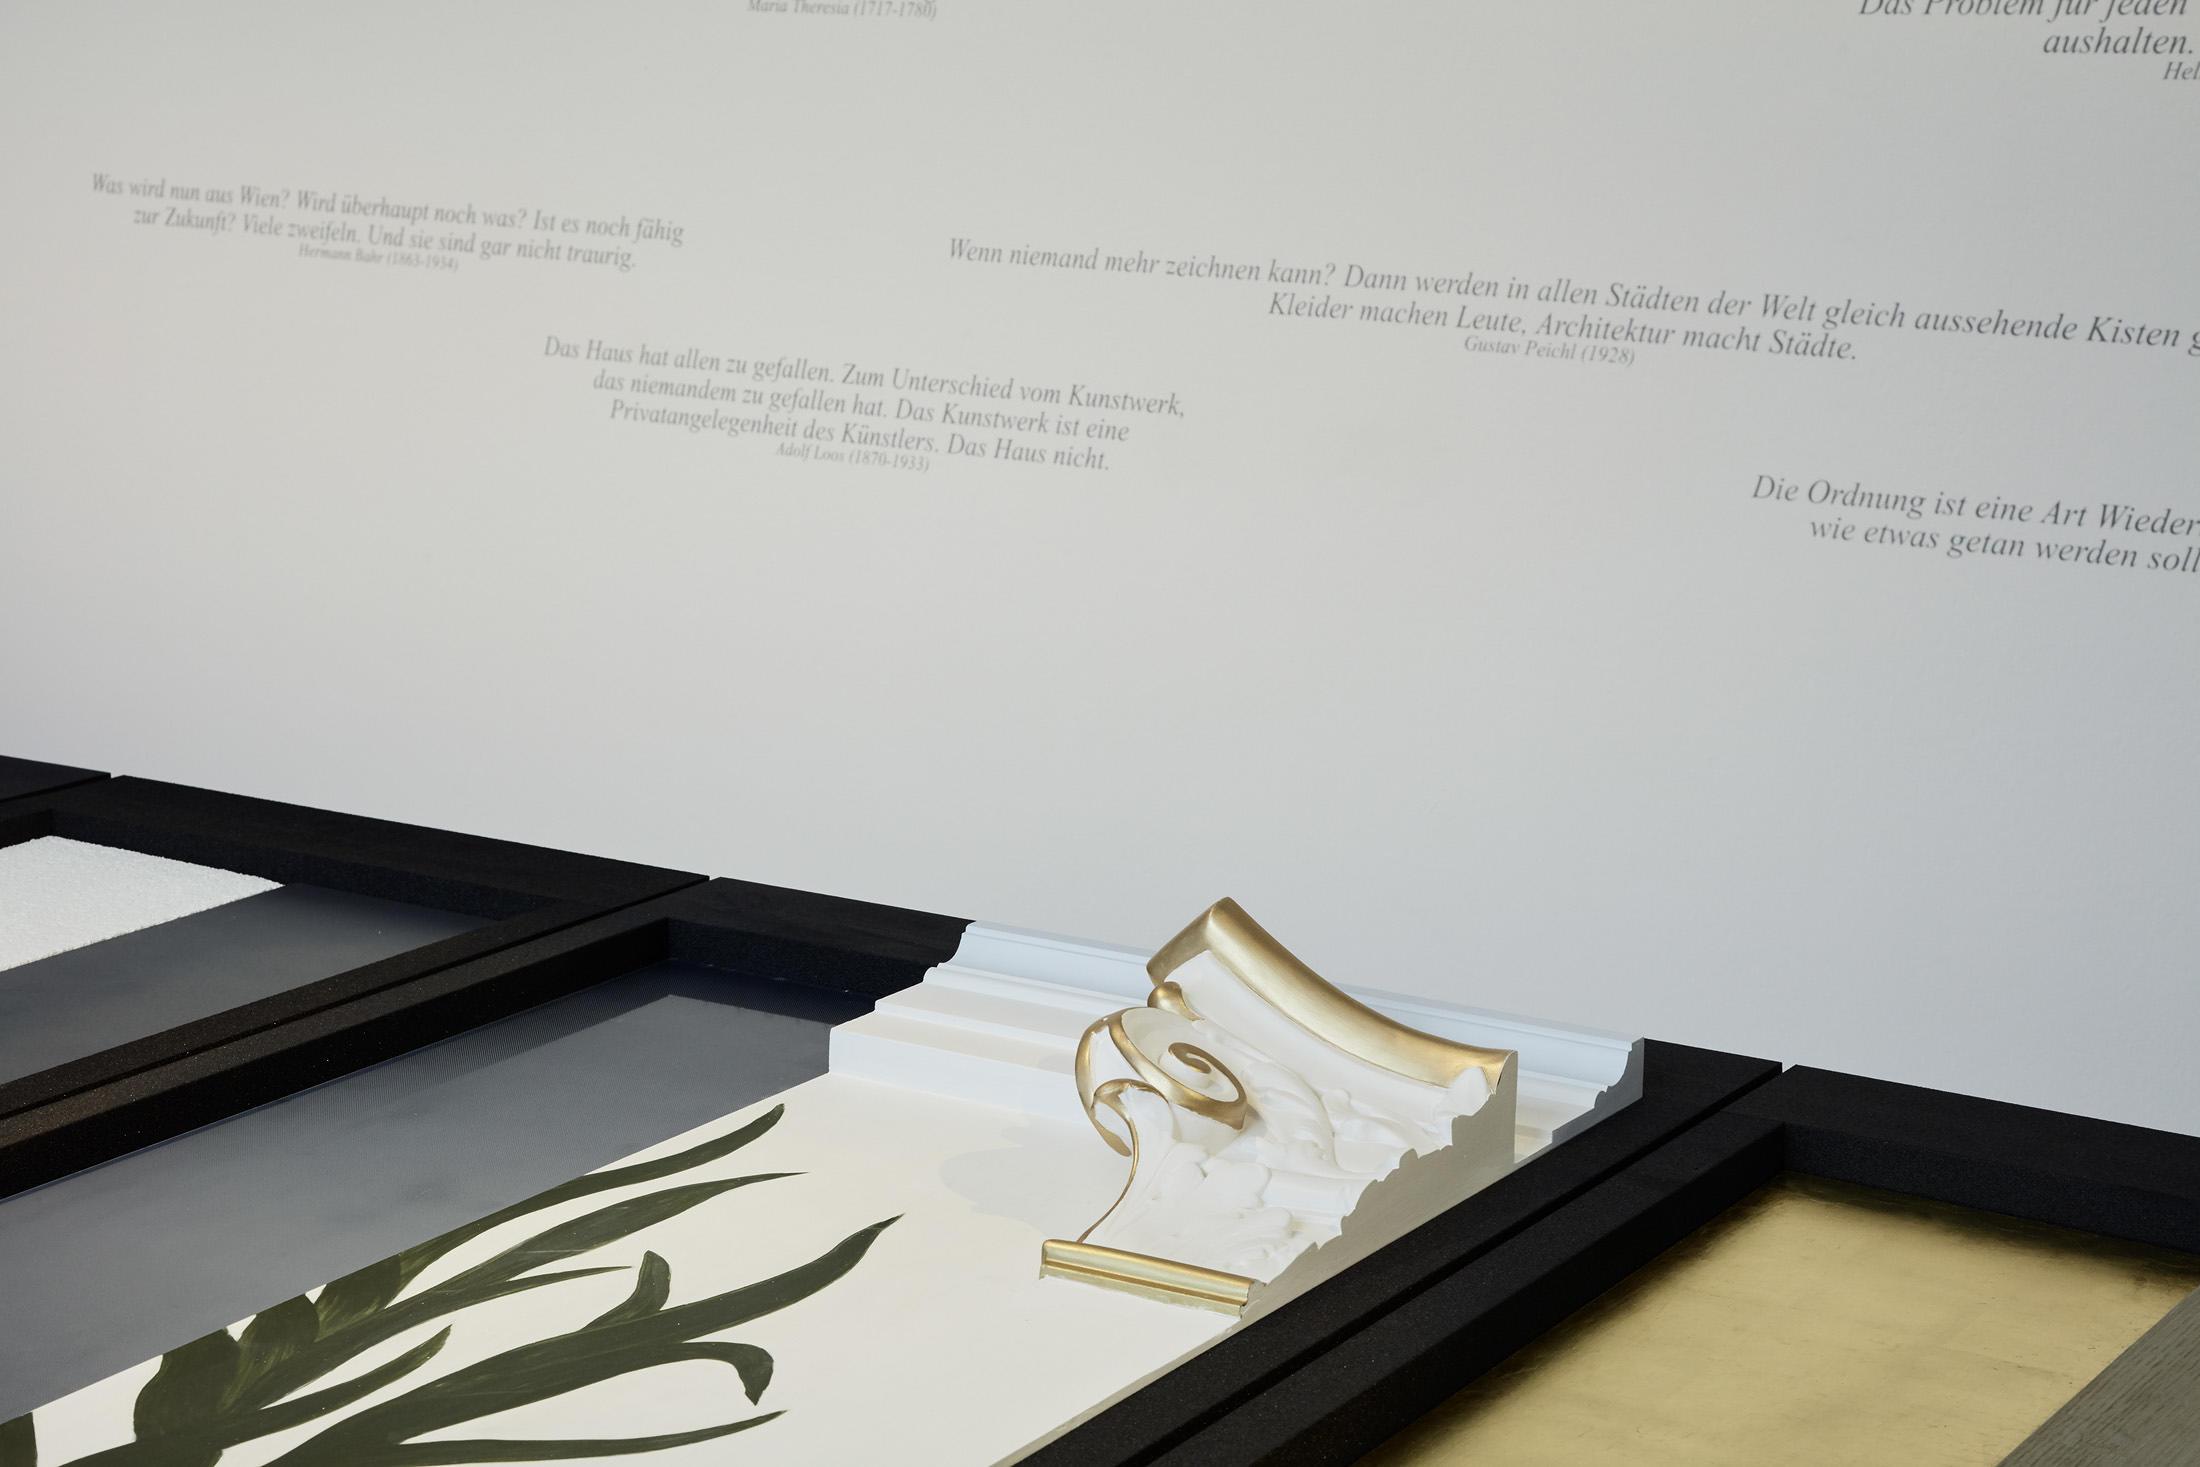 behf, wiener gemischter satz exhibition de behf architects